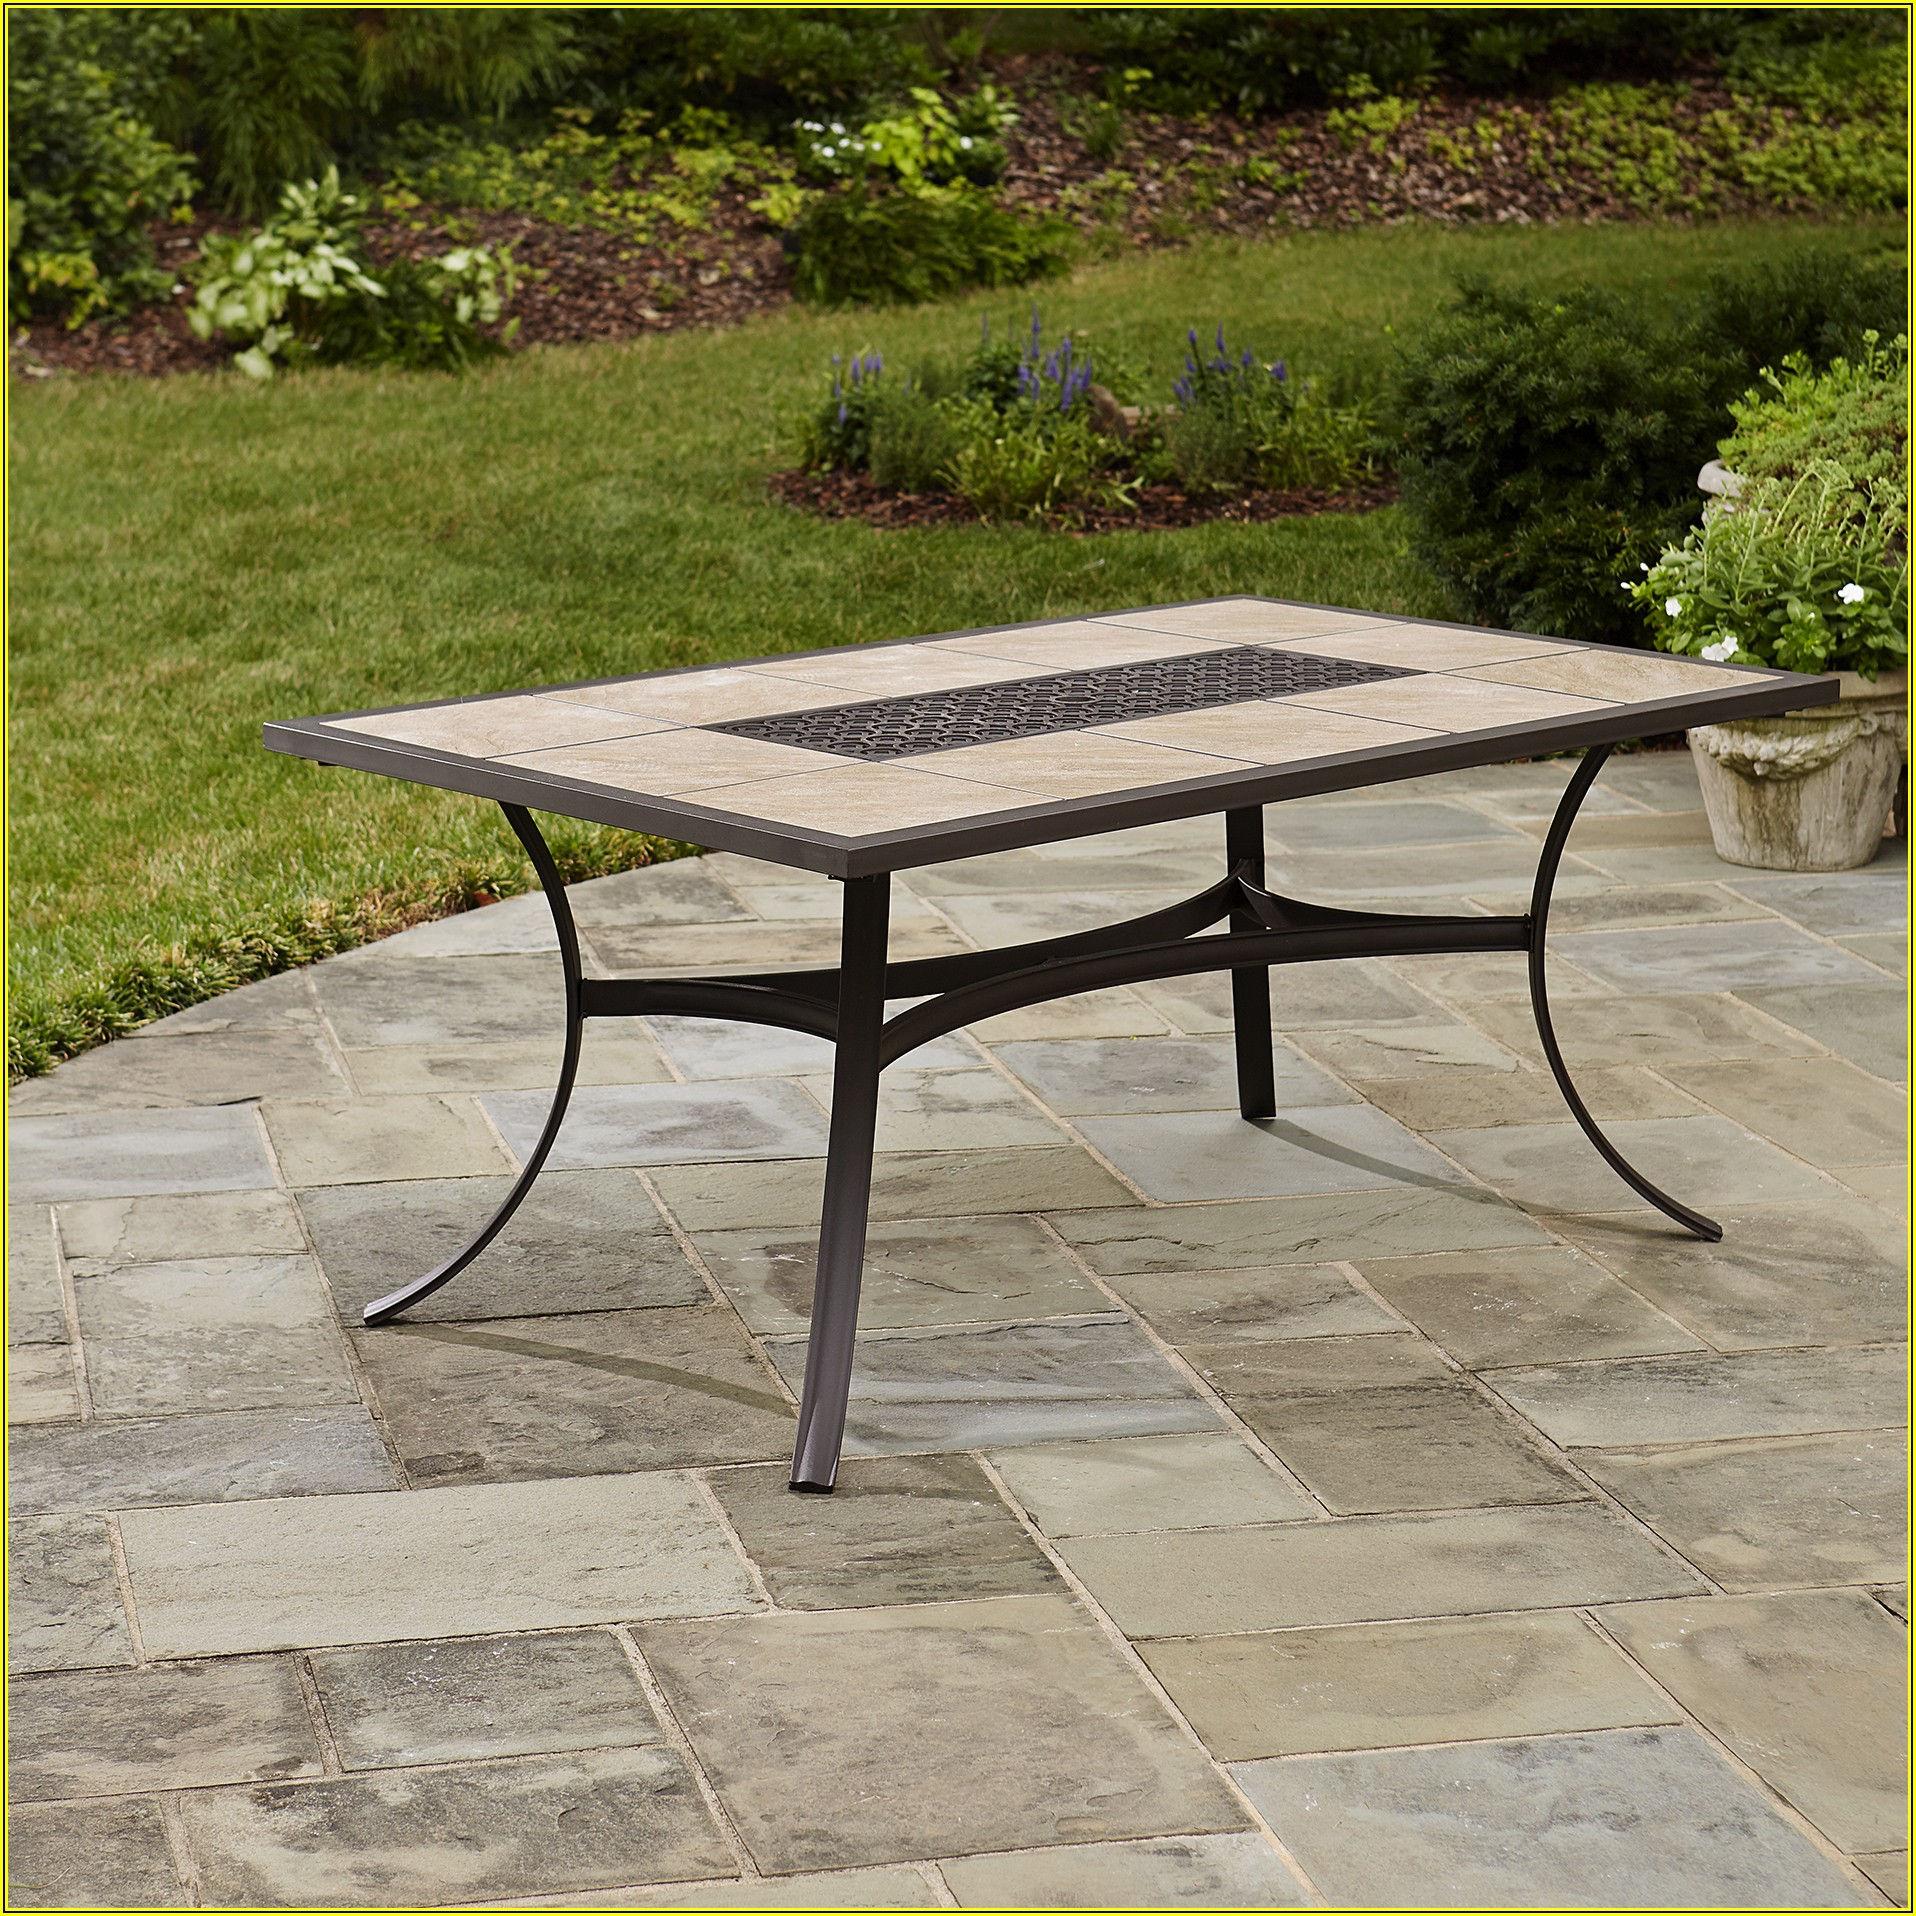 Hampton Bay Patio Table Replacement Tiles